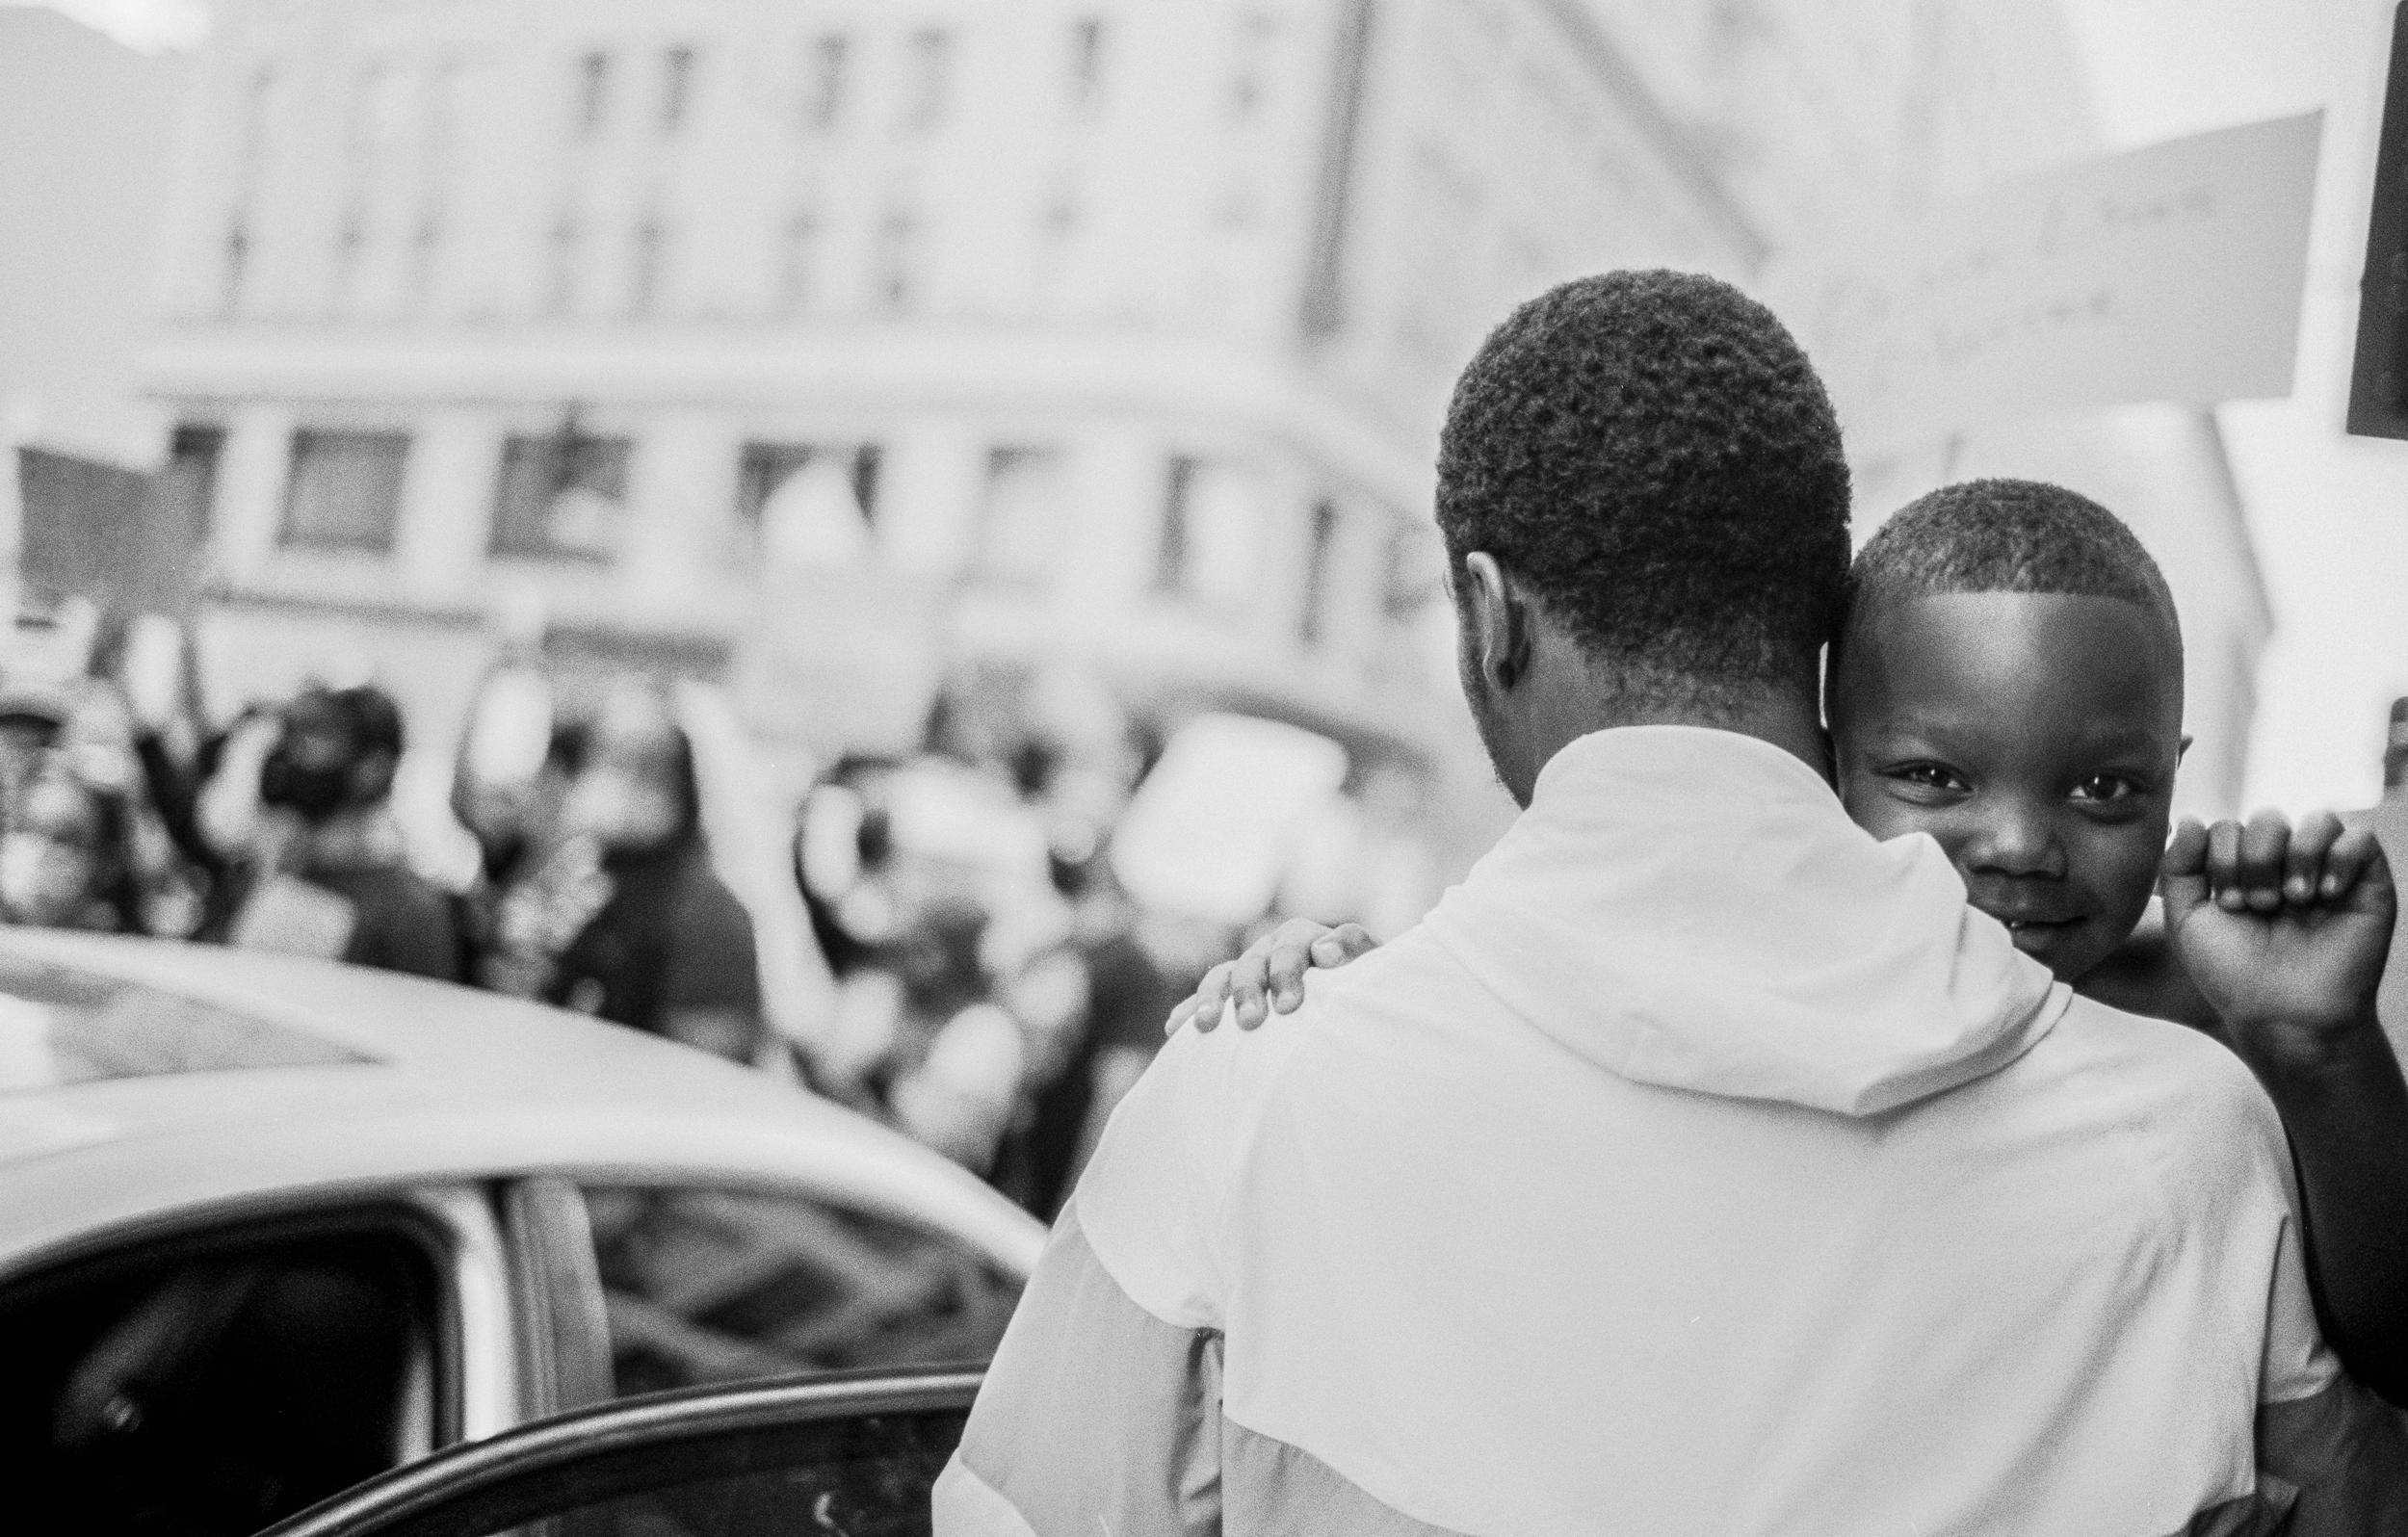 Boy looking over father's shoulder (Pic: Stephen Vanasco)